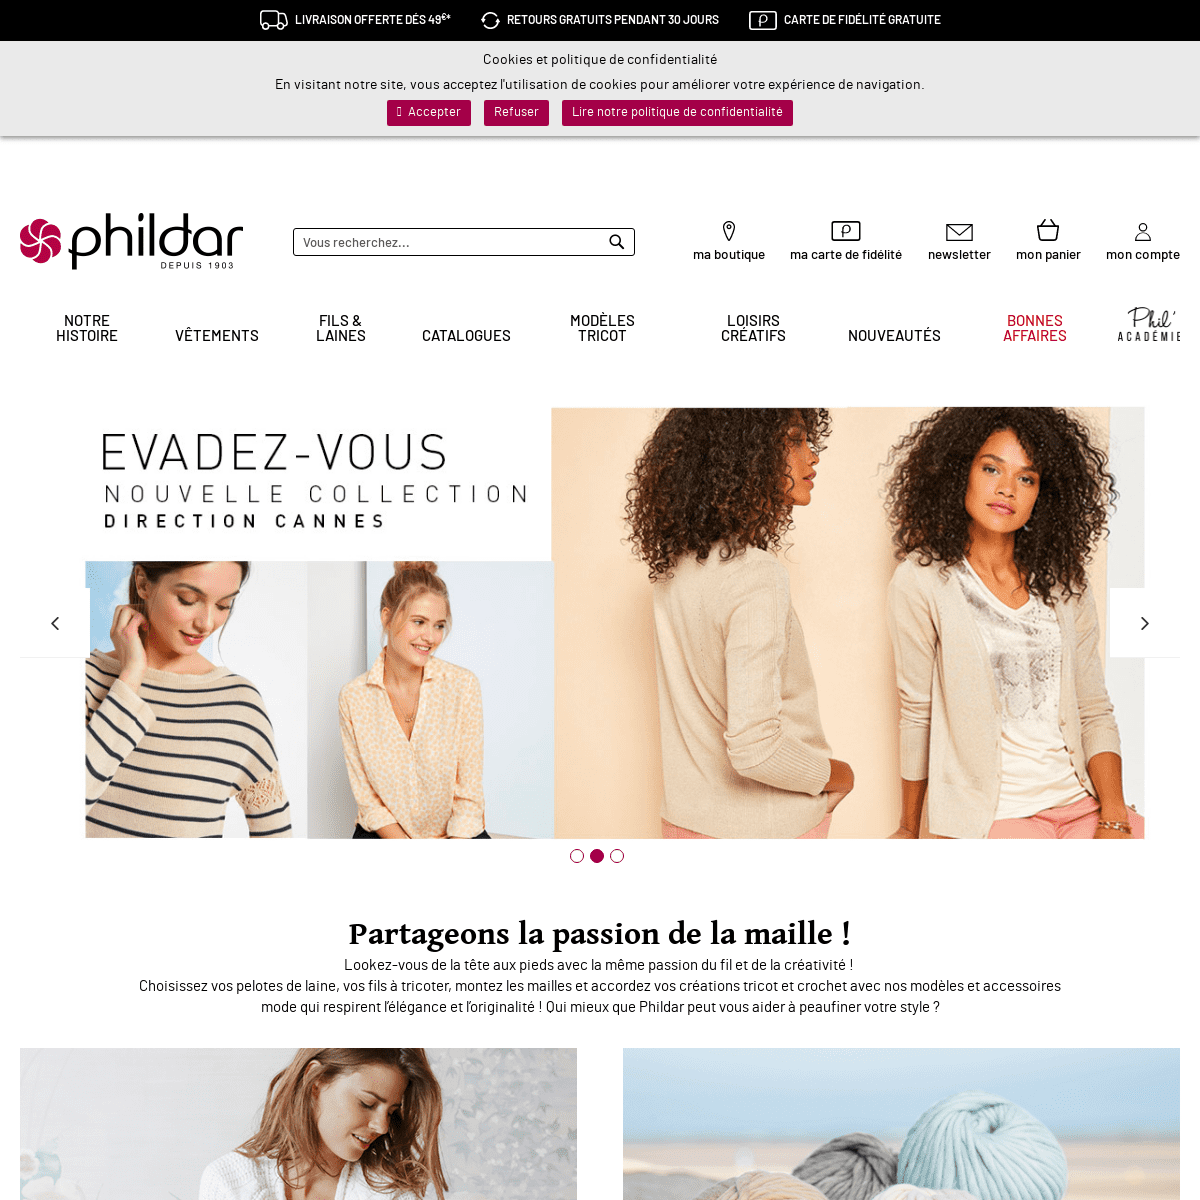 ArchiveBay.com - phildar.fr - PHILDAR - Achat Laine Tricot & Crochet • Depuis 1903 • Phildar